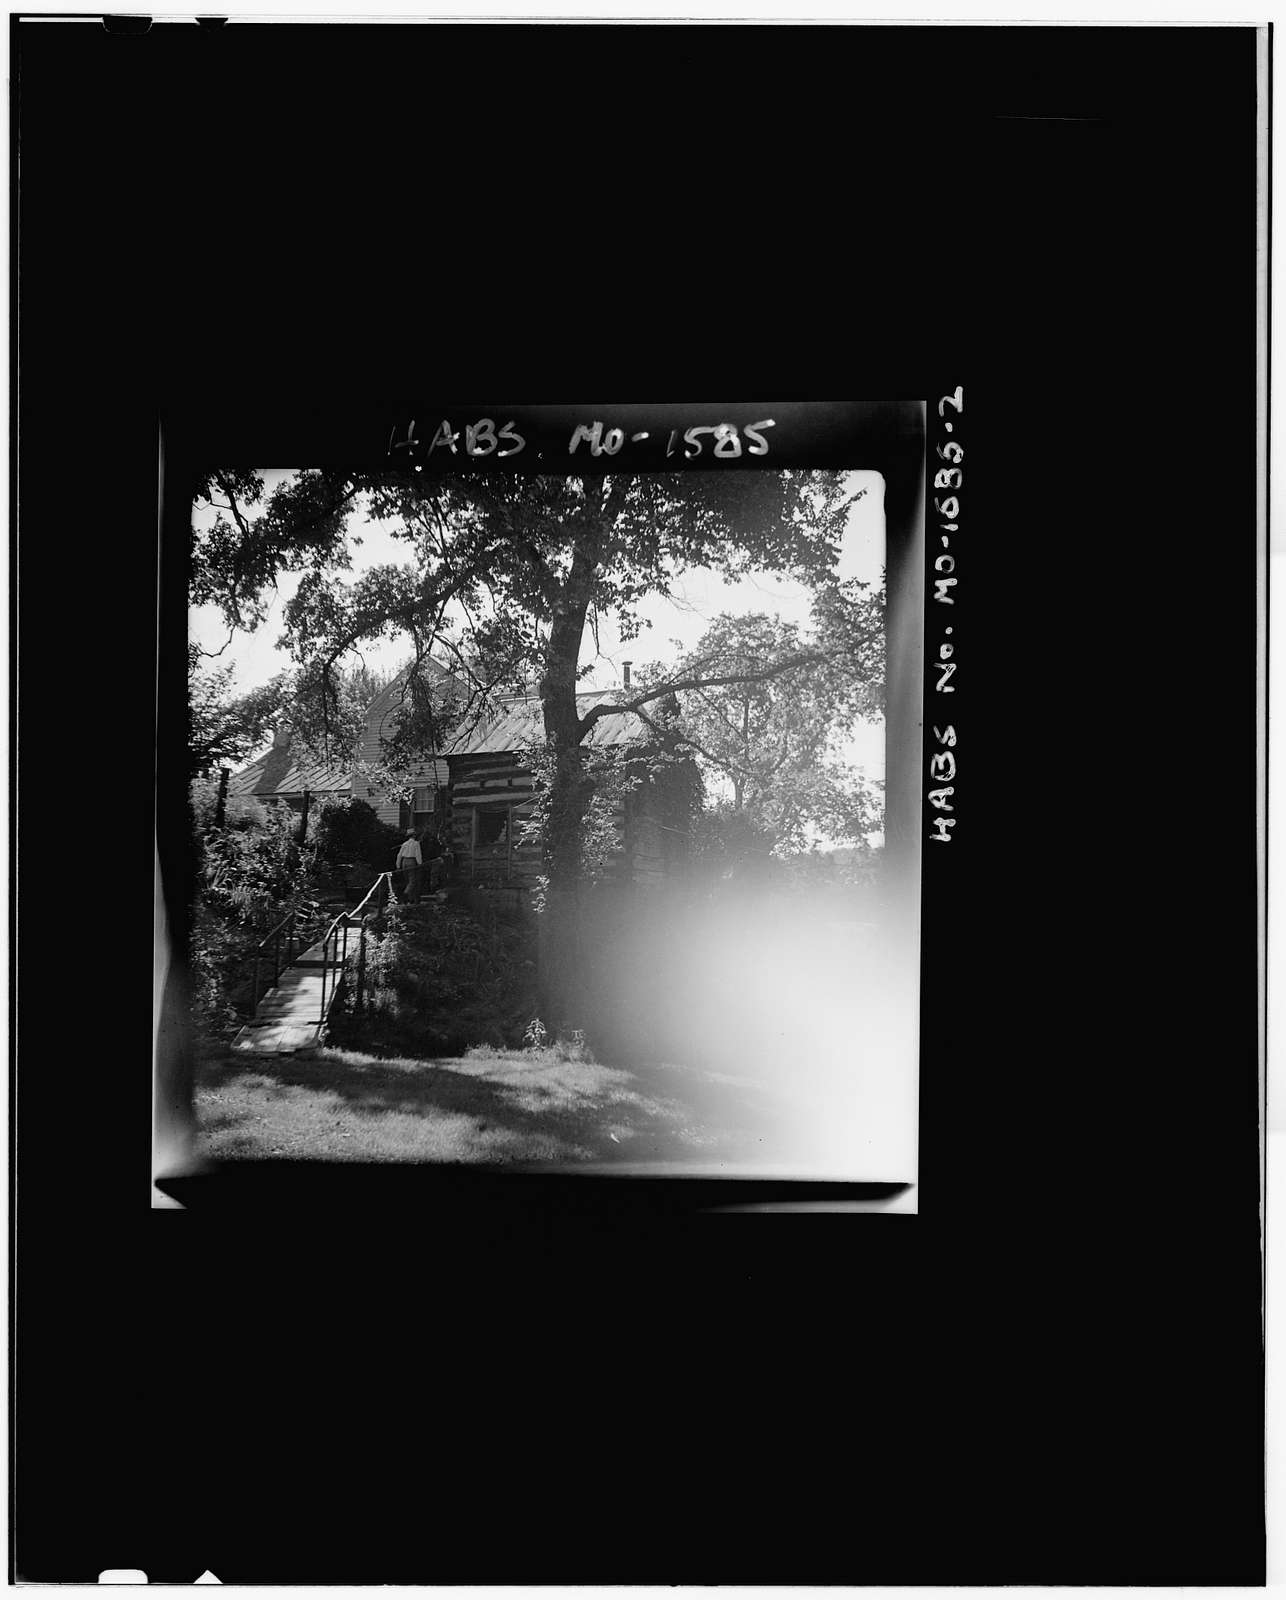 Log Cabin, Femme Osage, St. Charles County, MO